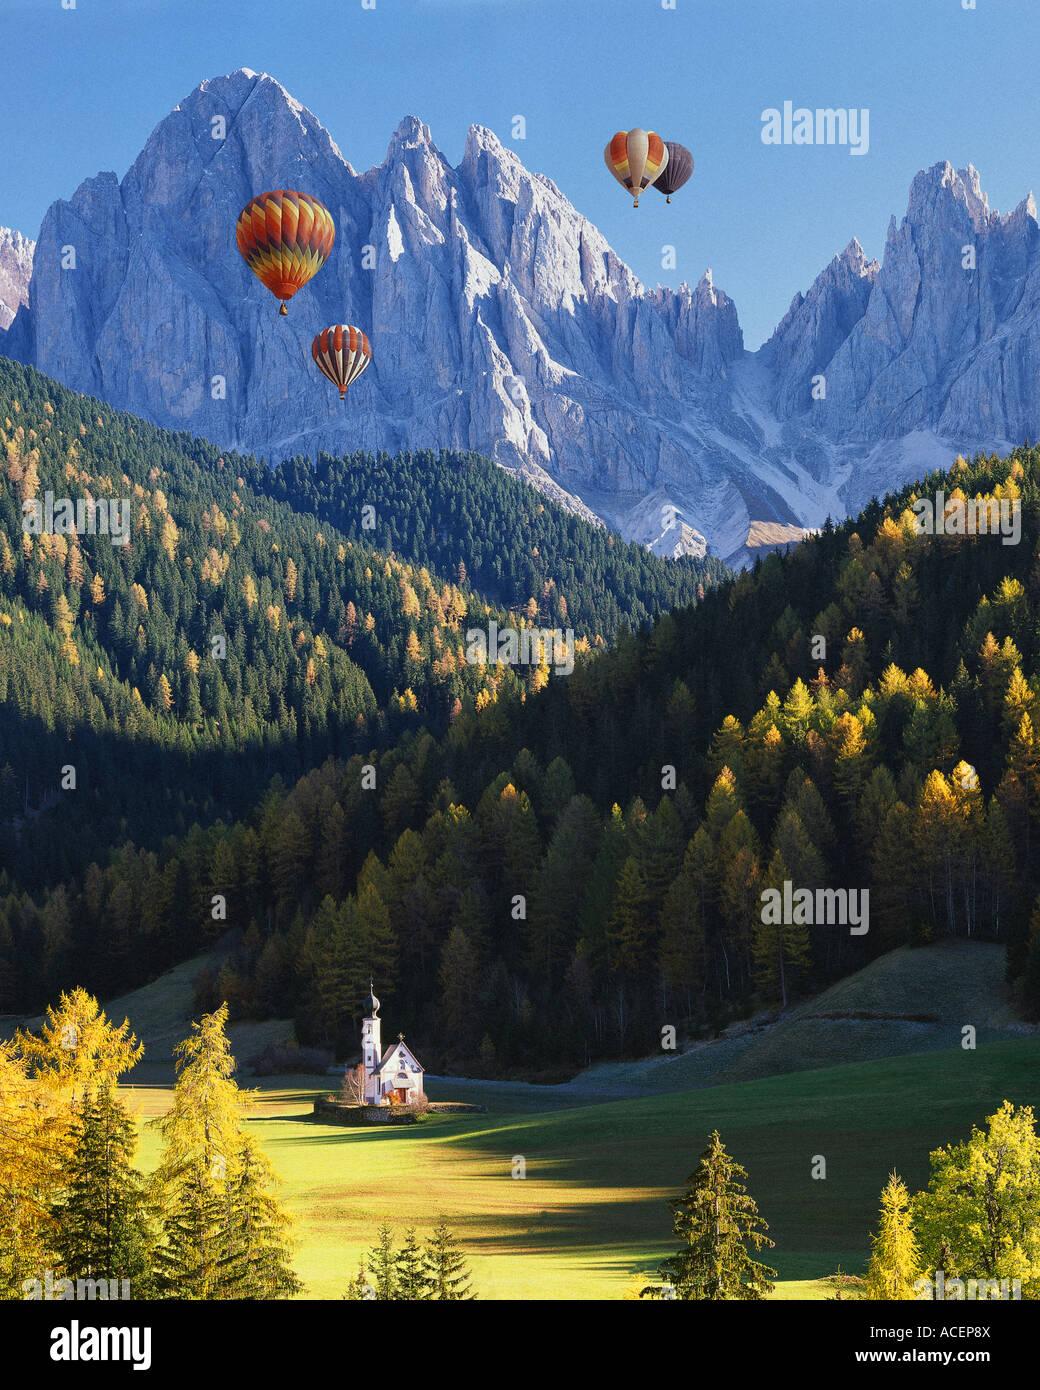 IT - DOLIMITES: San Giovanni in Ranui e Geisler Spitzen Montagne Immagini Stock